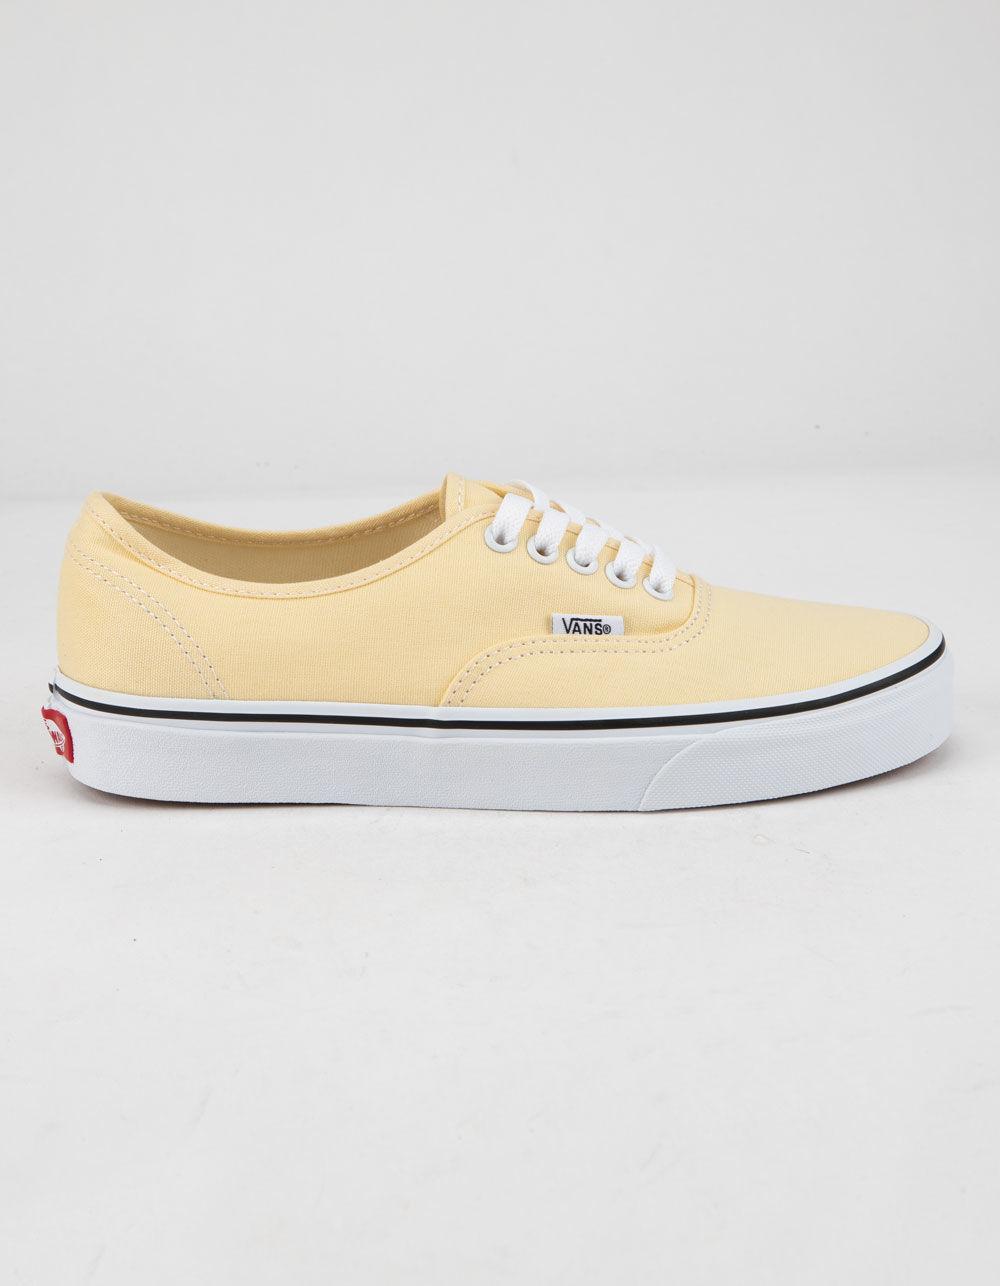 077c91e9f7 Lyst - Vans Authentic Vanilla Custard   True White Womens Shoes in ...